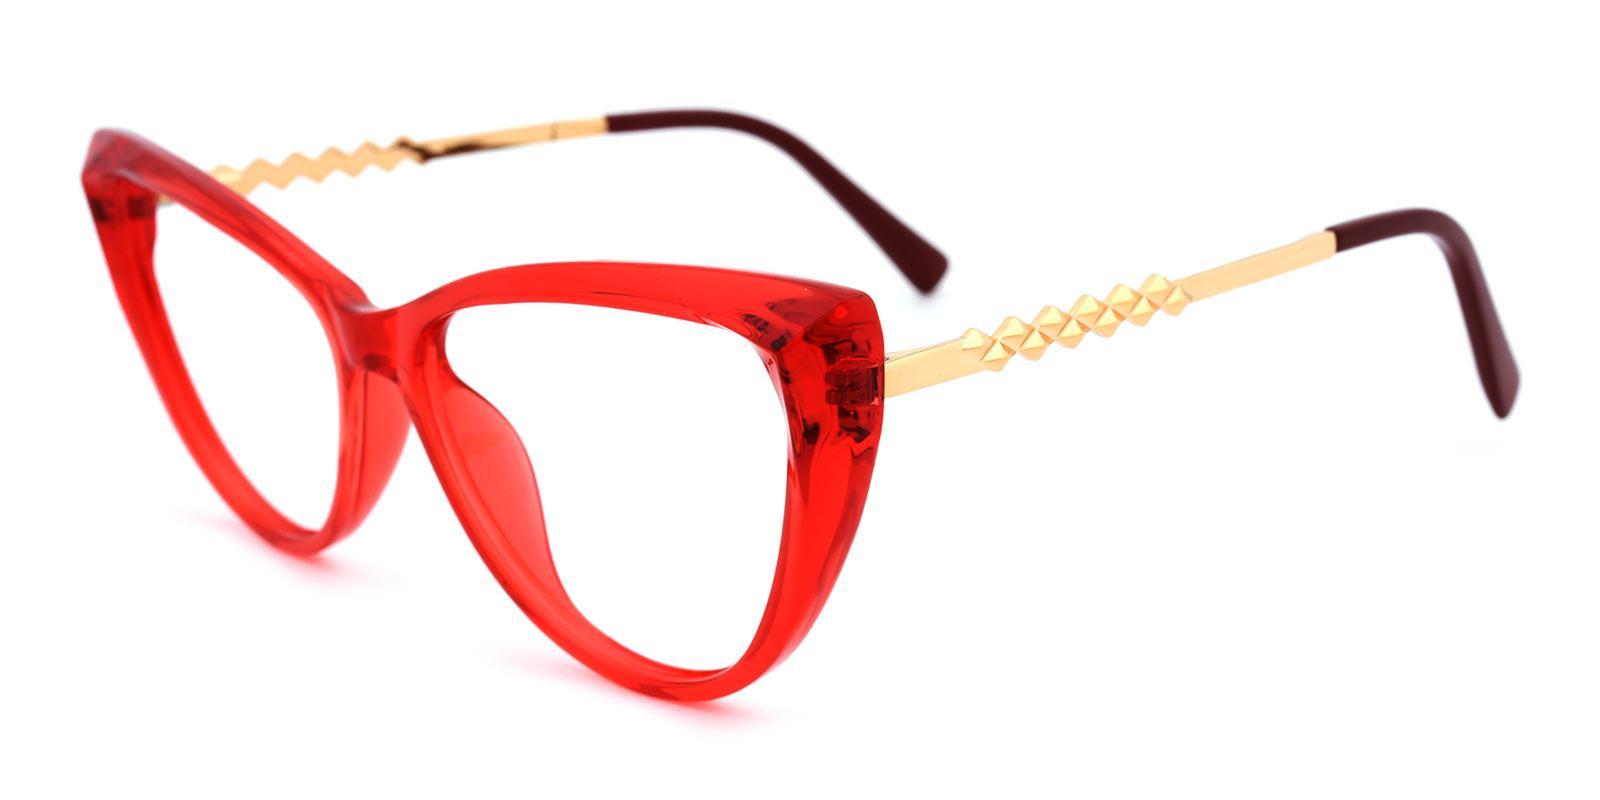 Daydream-Red-Cat-Acetate-Eyeglasses-detail